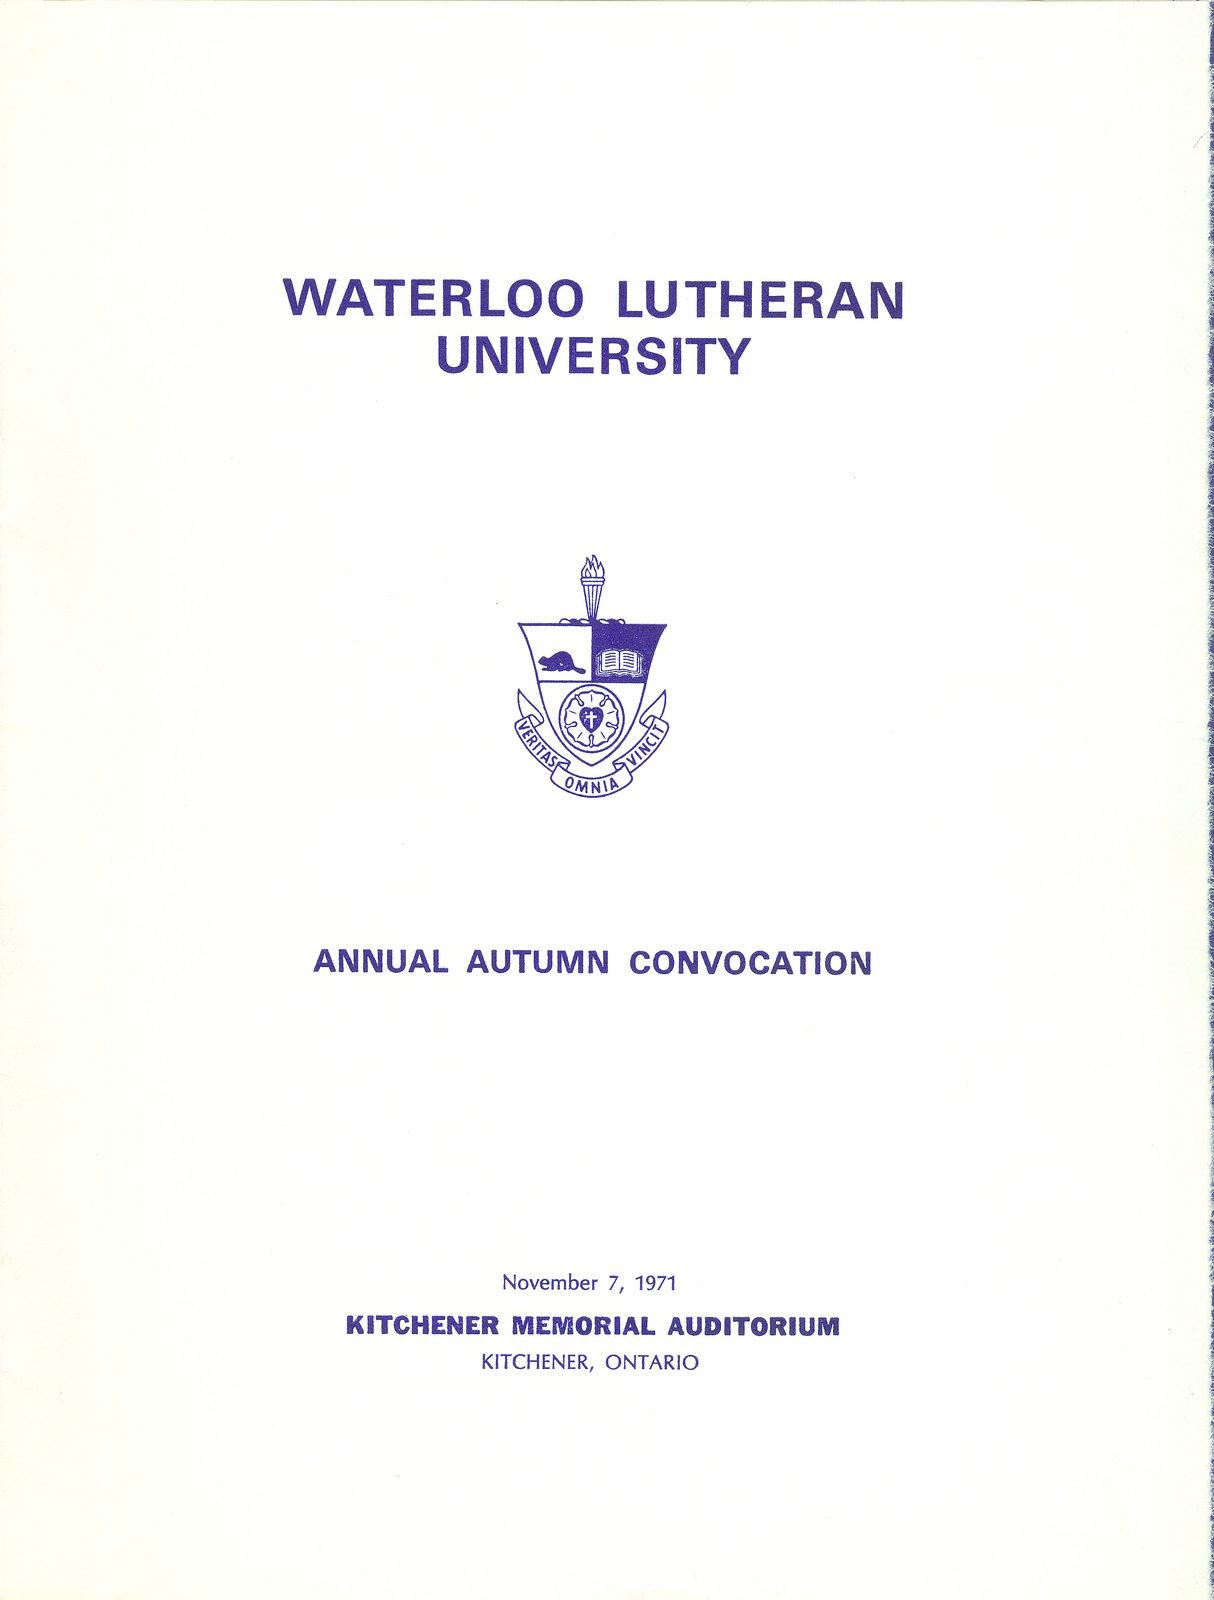 Waterloo Lutheran University fall convocation 1971 program